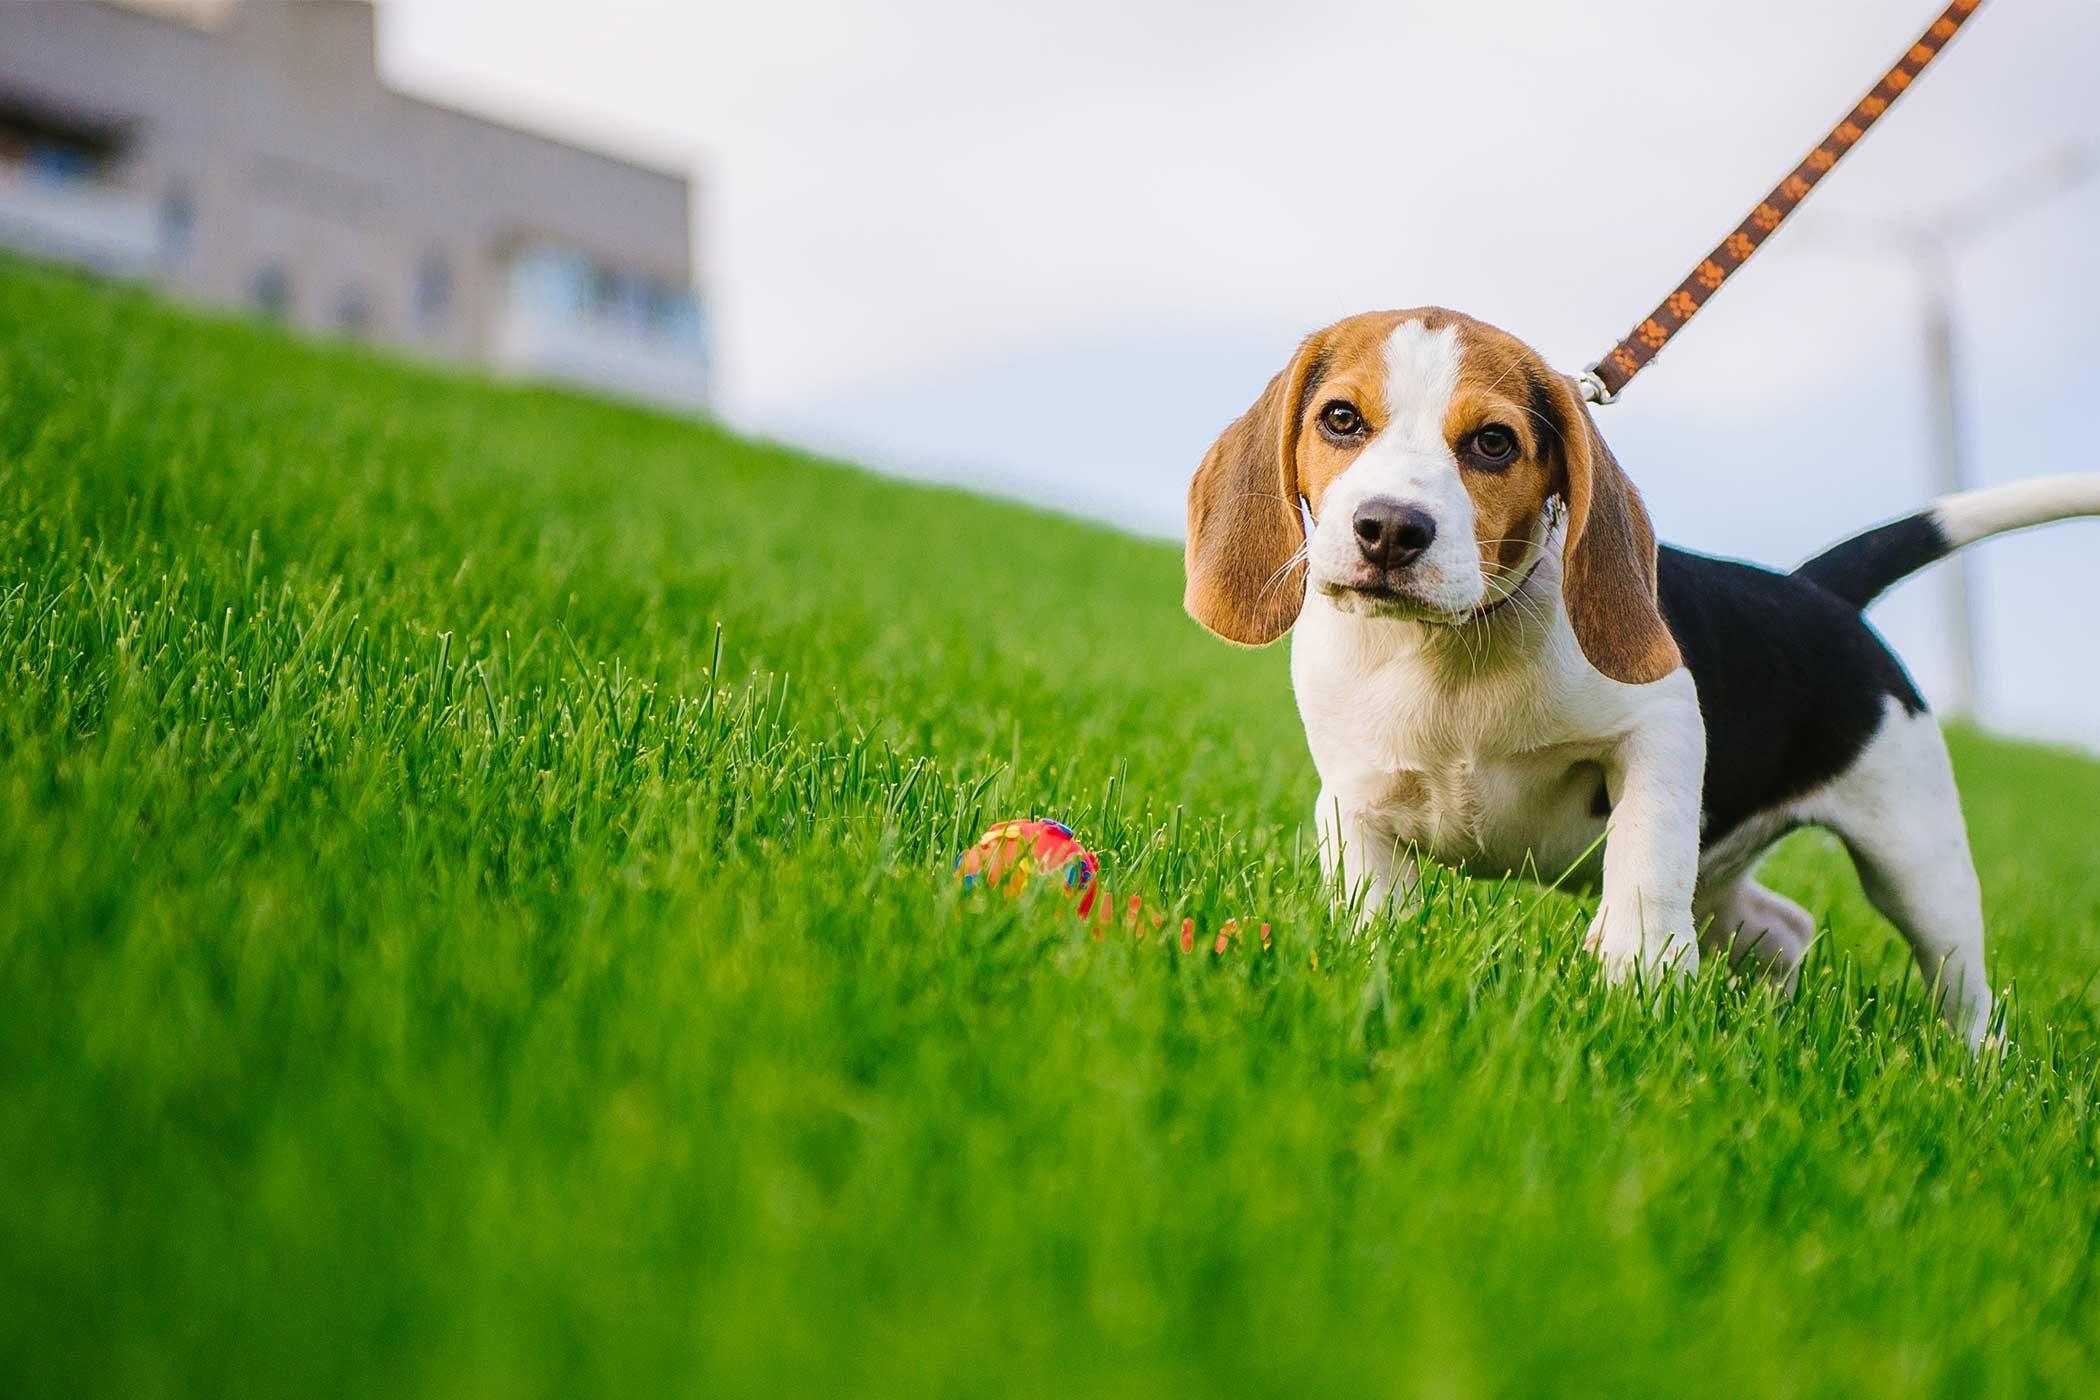 Dog Leash Loose Walking